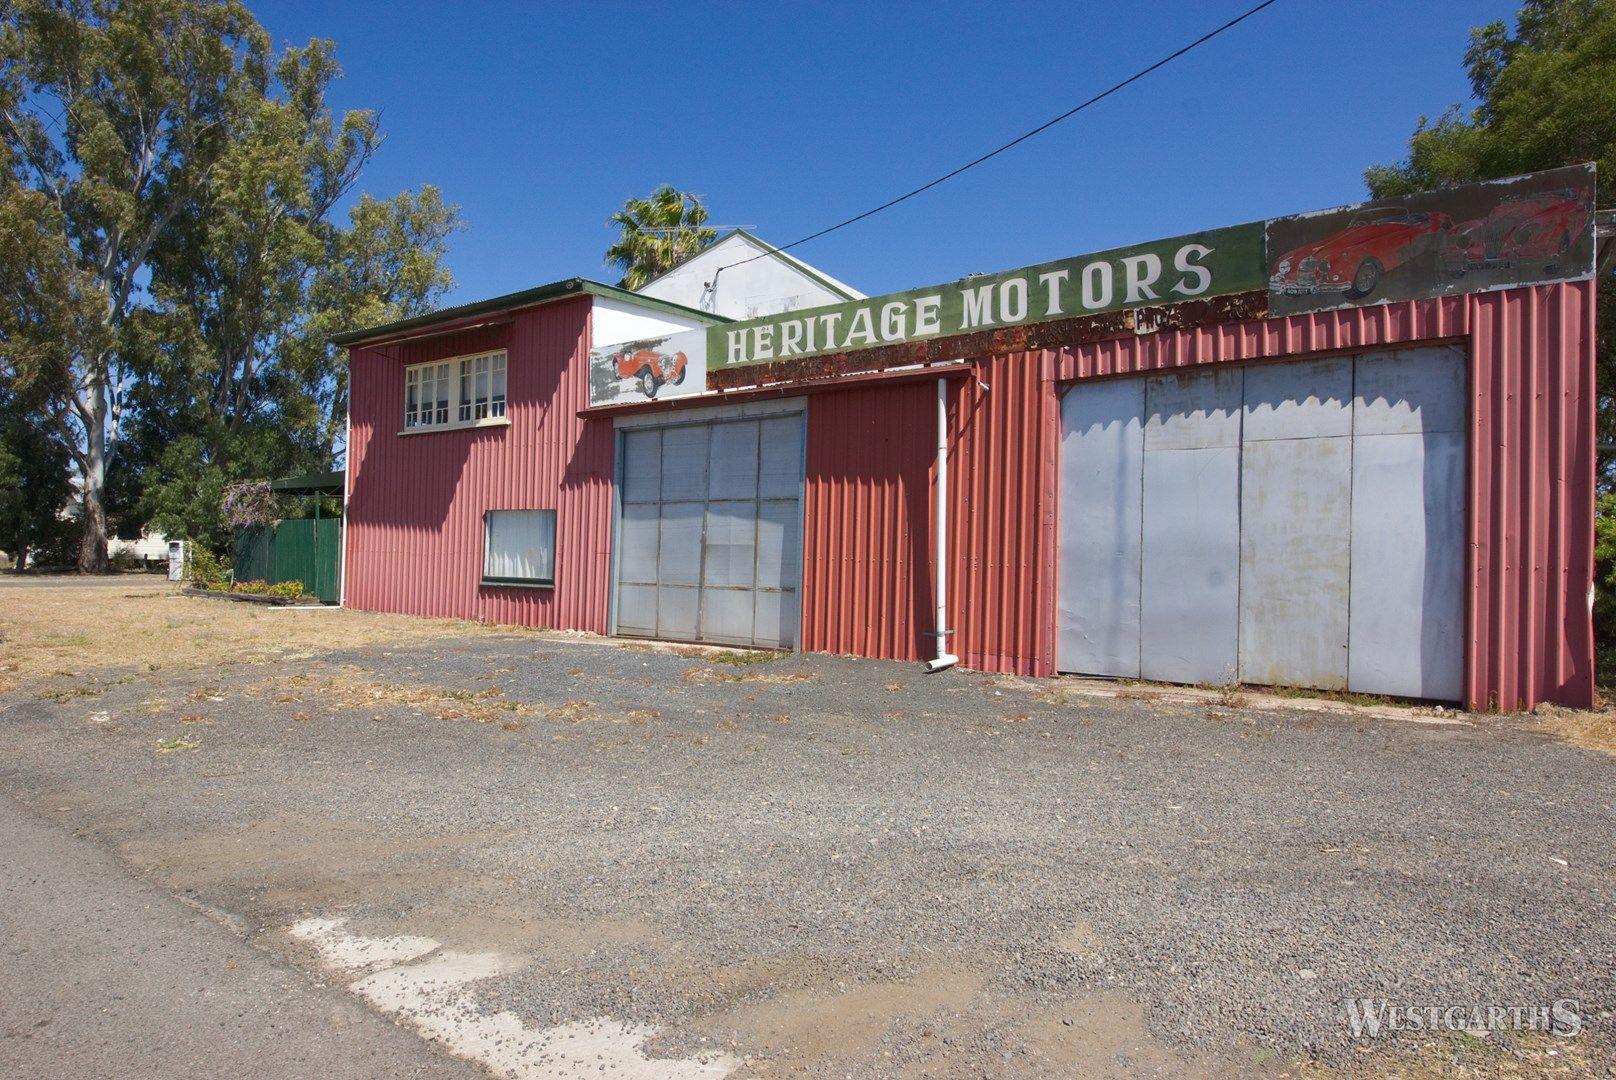 6/12 Warrego Highway, Jondaryan QLD 4403, Image 0